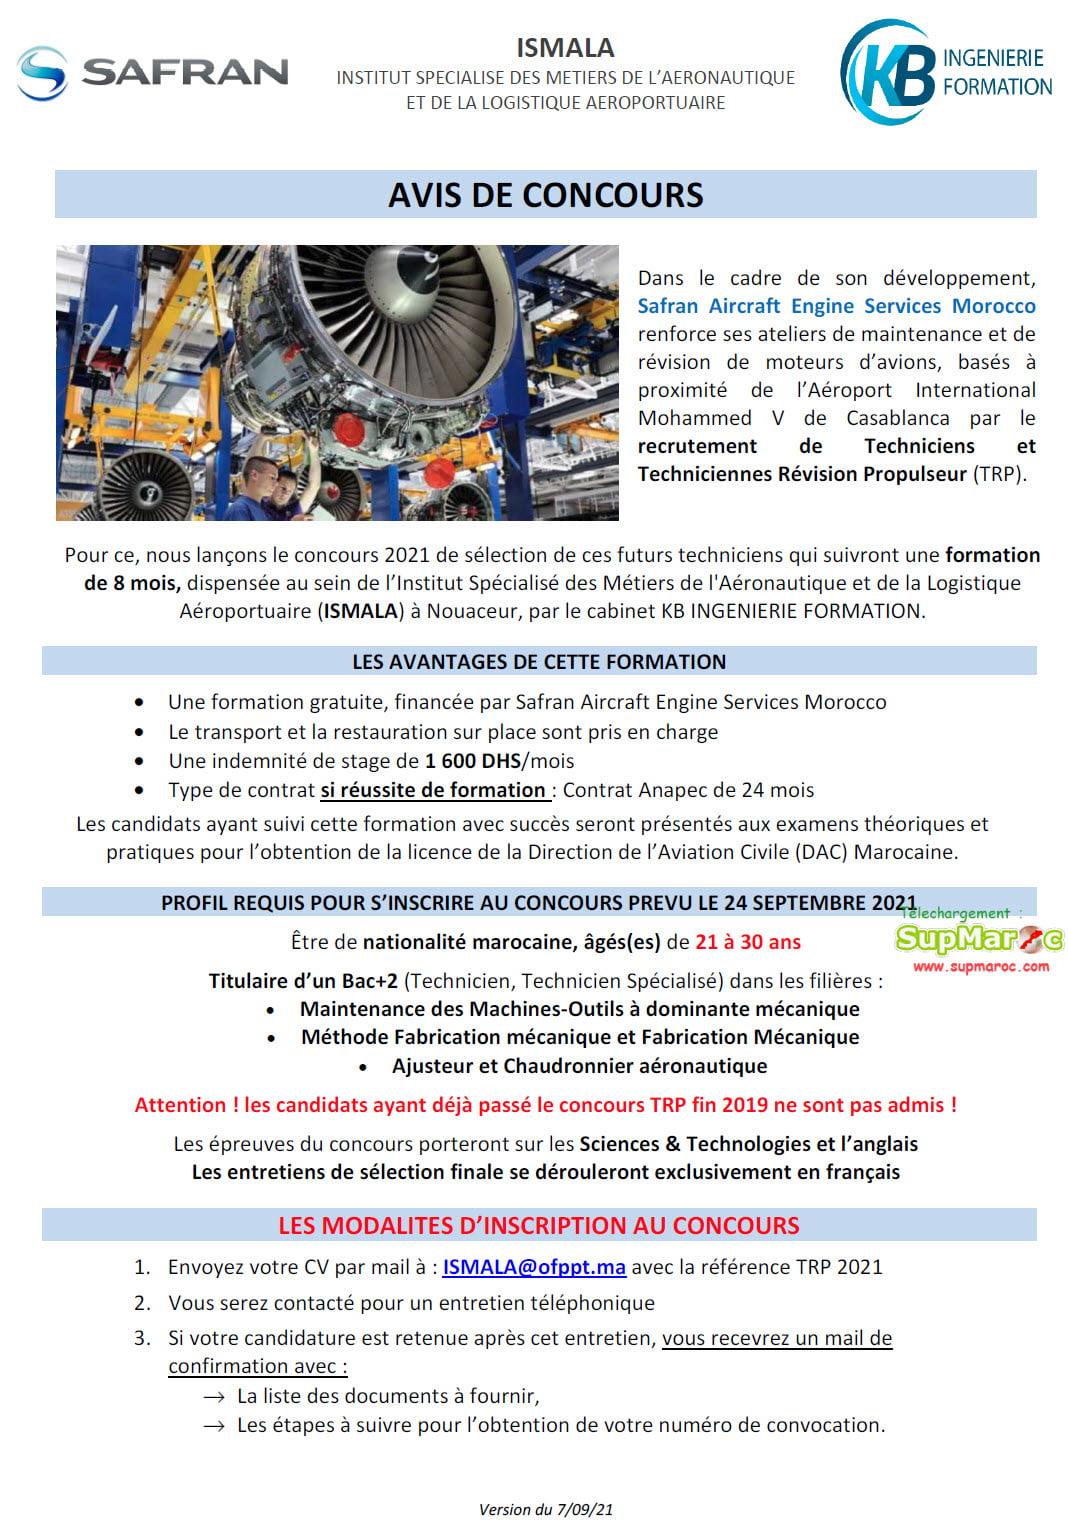 ISMALA Recrutement techniciens Safran Aircraft Engine Services Morocco 2021